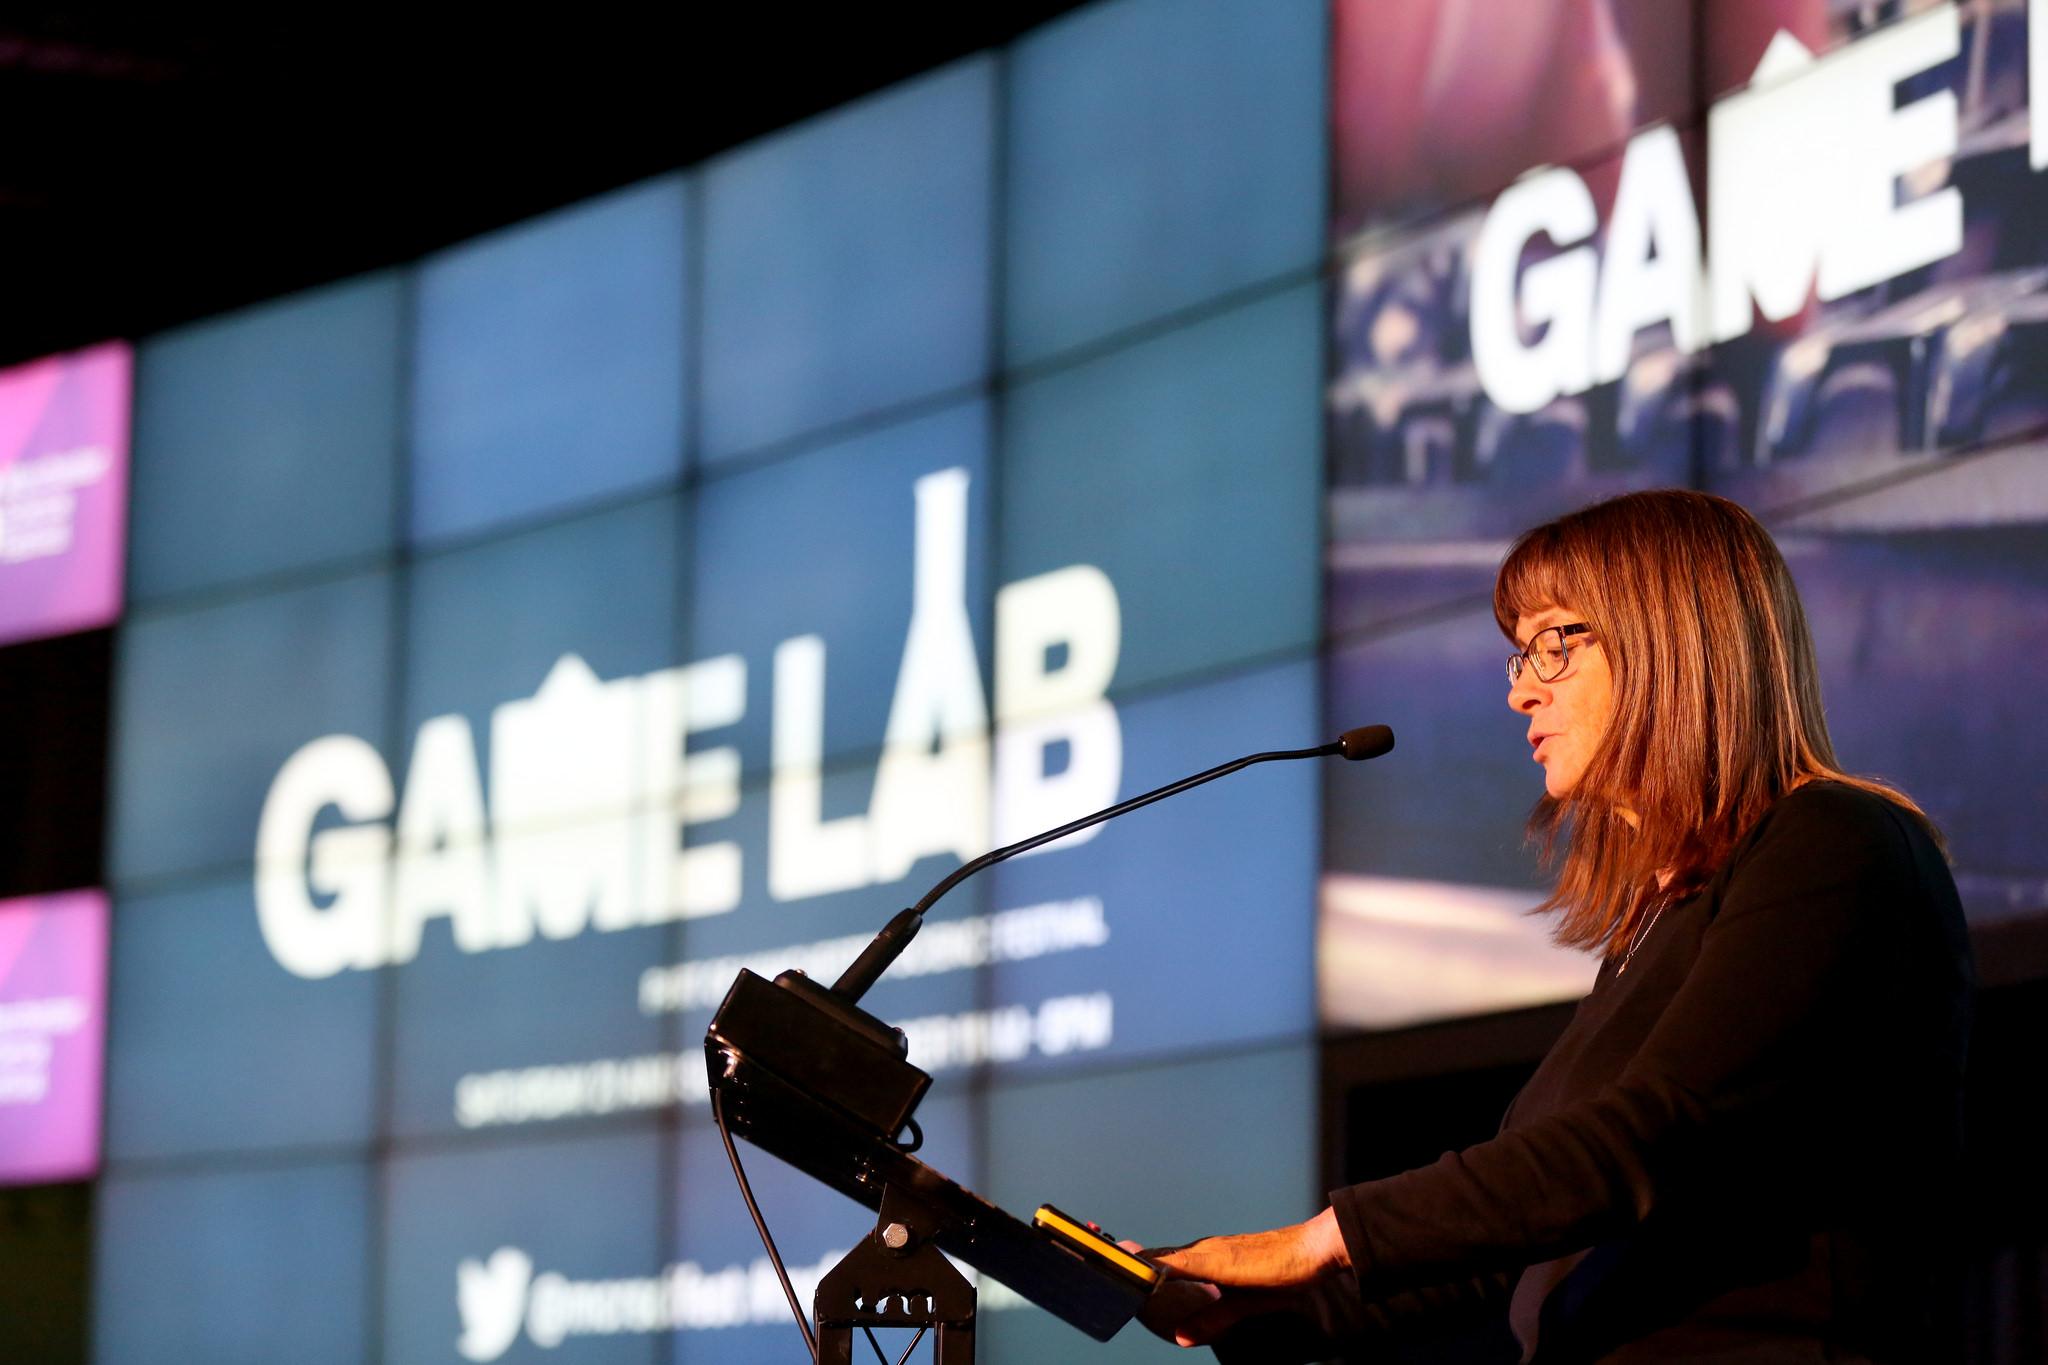 gamelab helen h.jpg